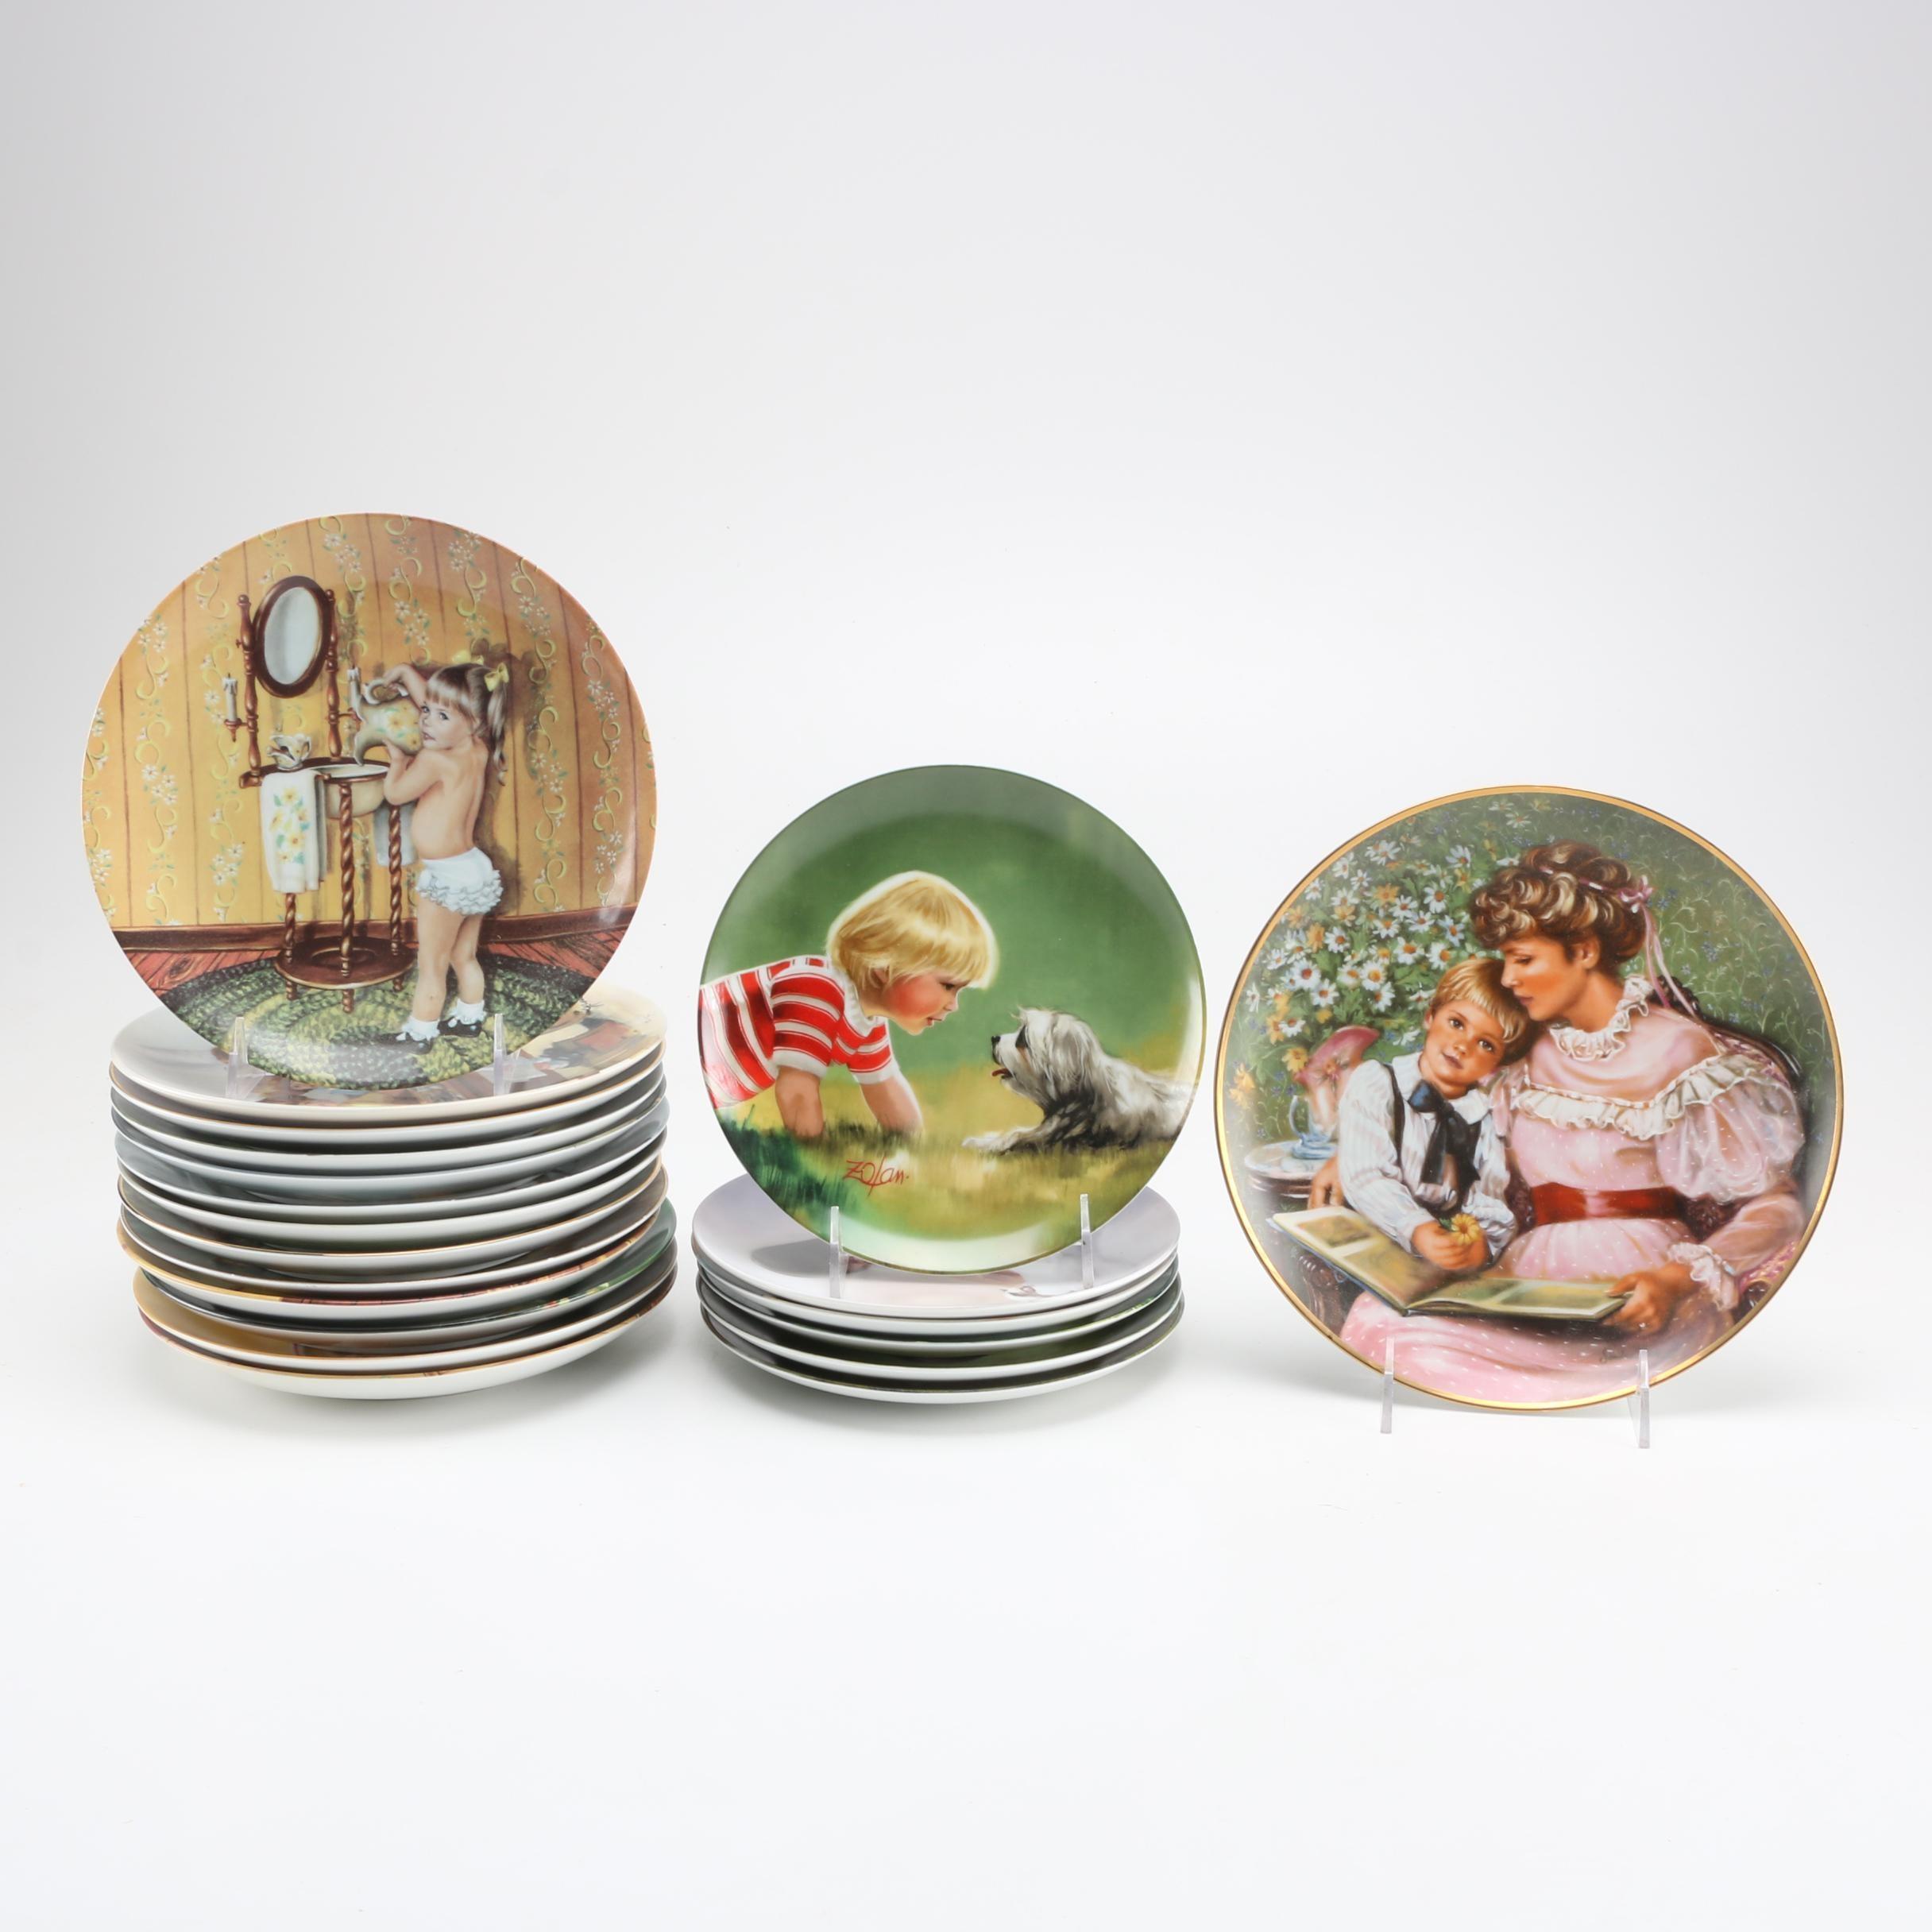 Circa 1980s Collectible Plate Assortment